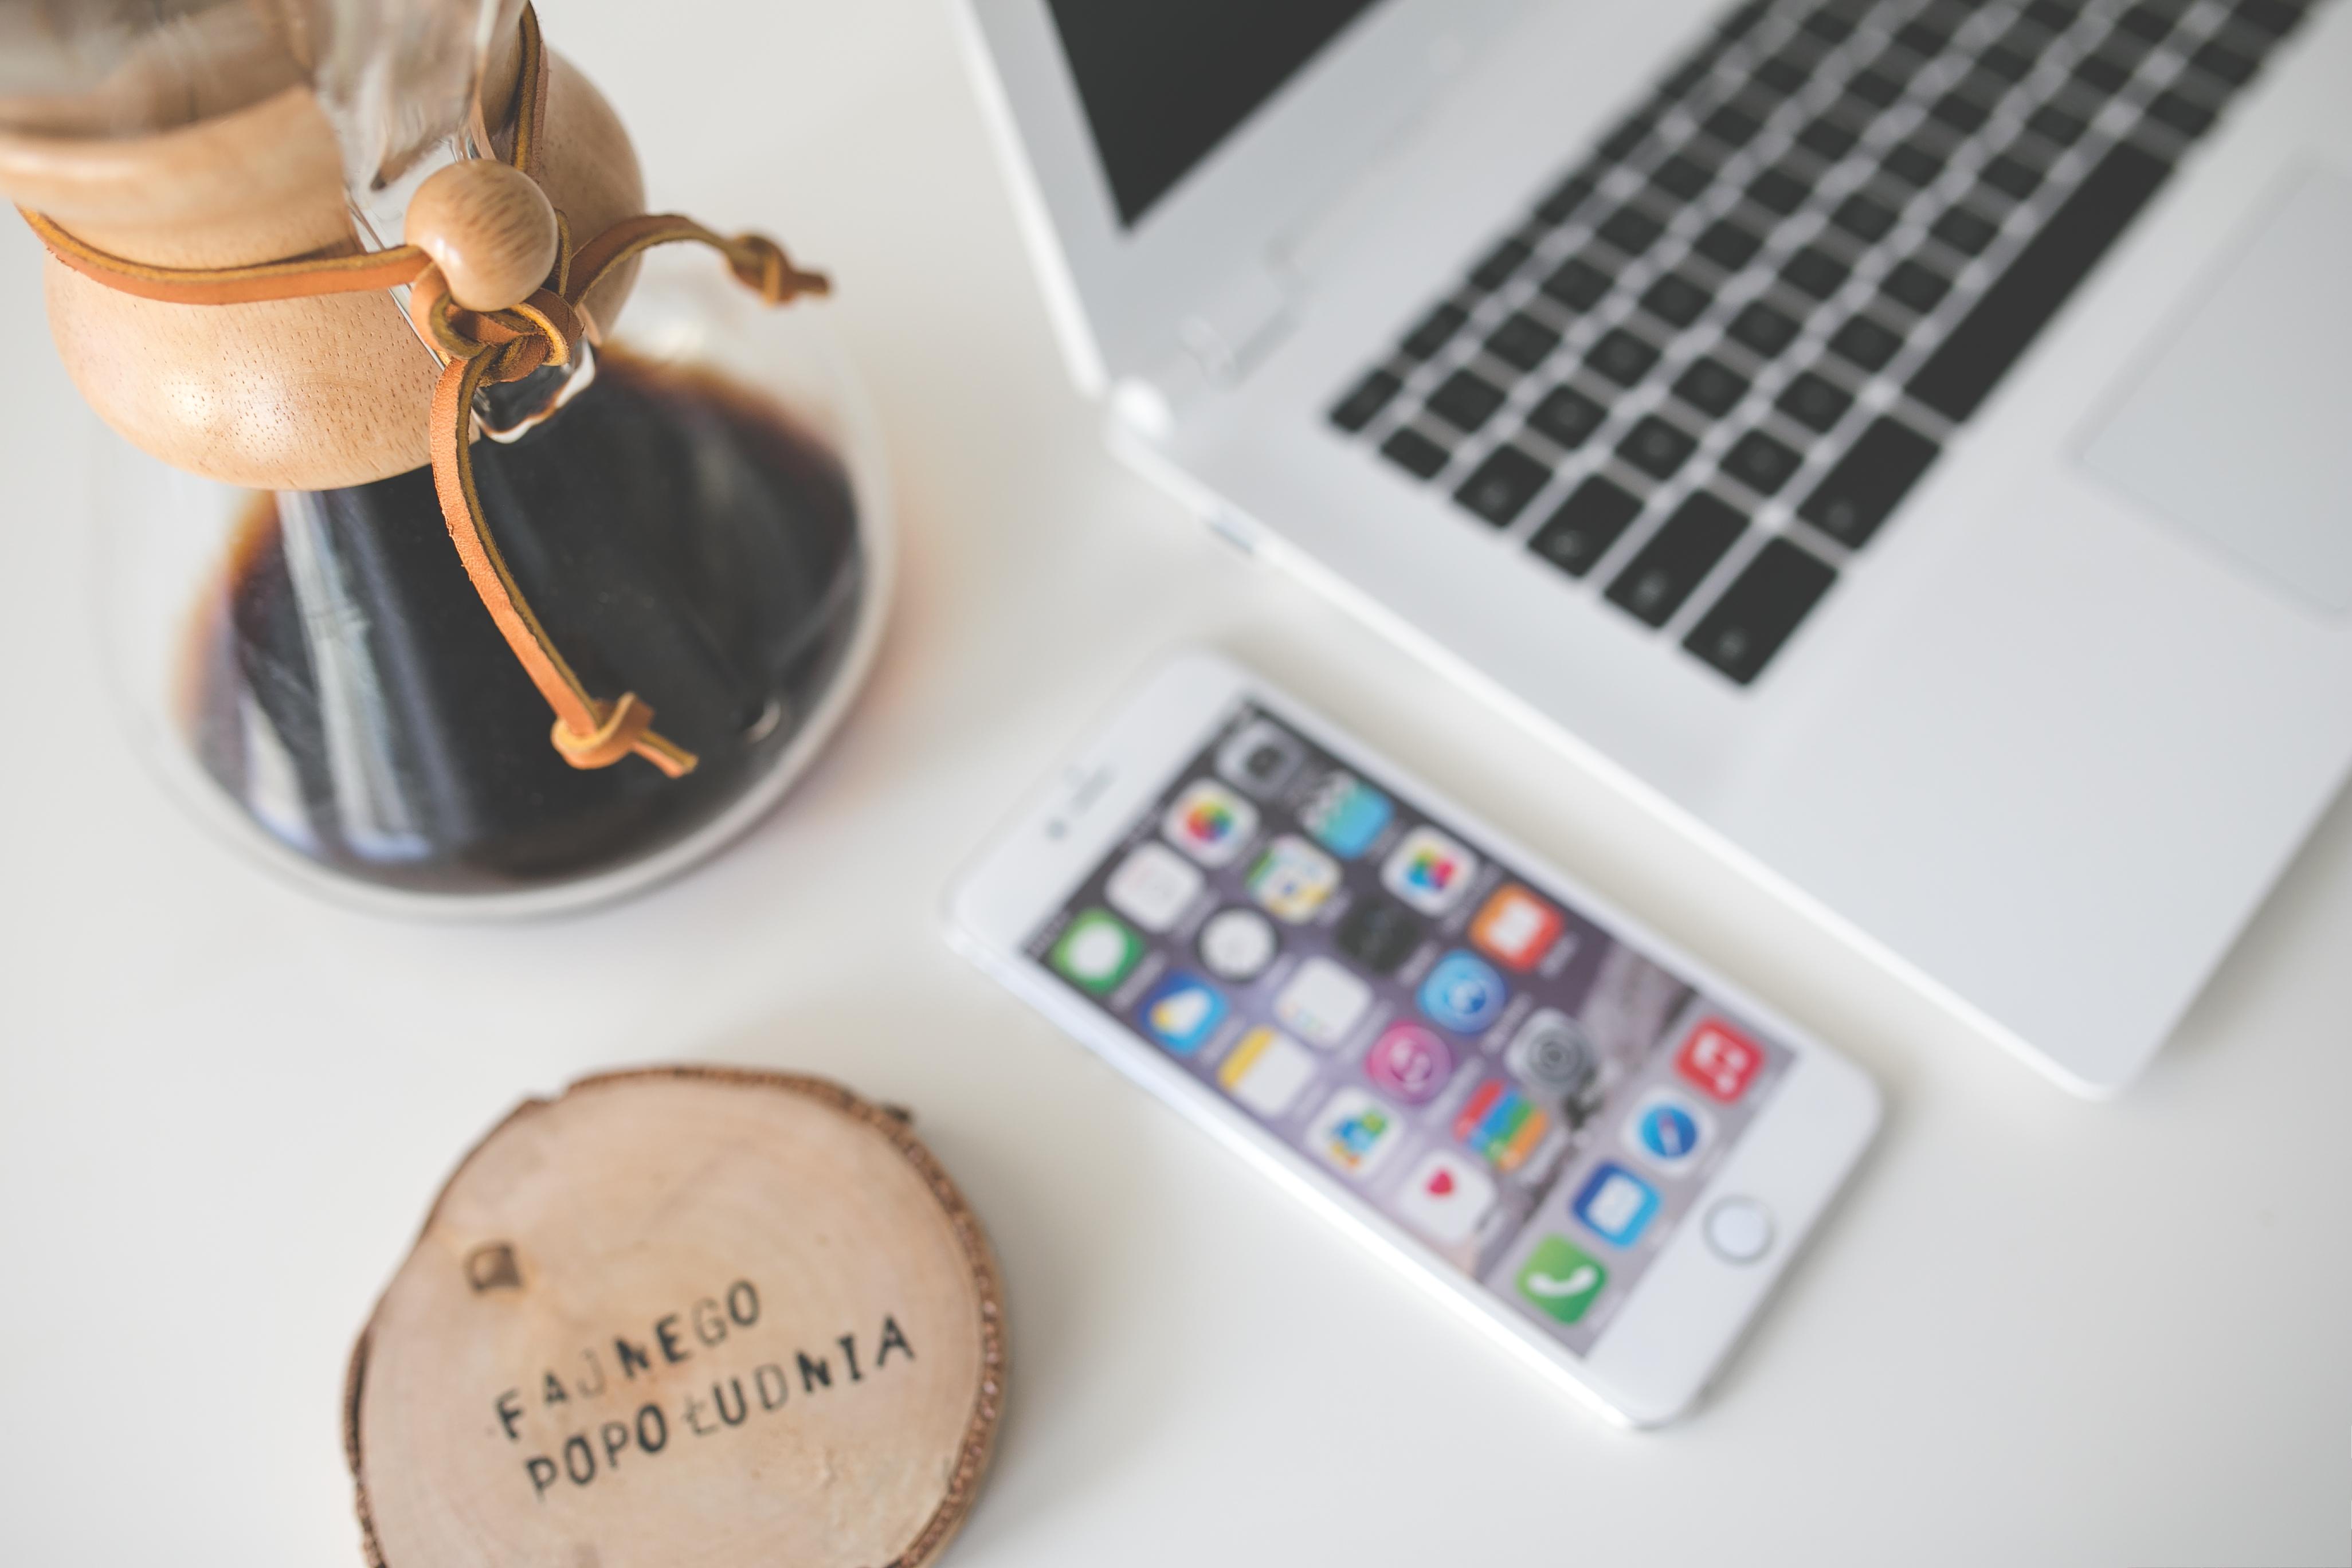 coffee-apple-iphone-desk